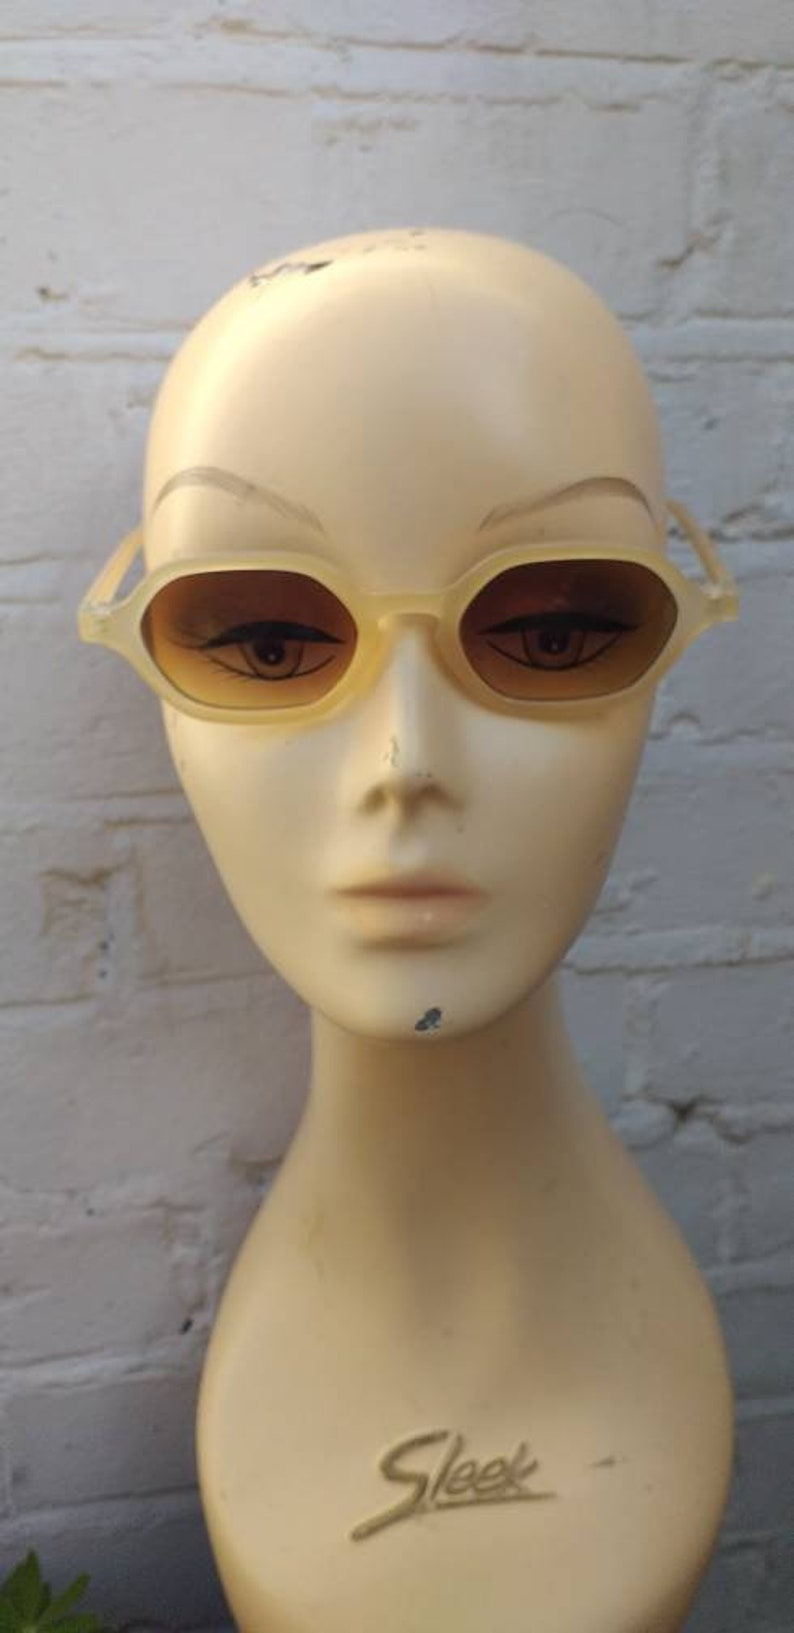 Retro Sunglasses | Vintage Glasses | New Vintage Eyeglasses Sunglasses Cream 1930s 1940s style $11.54 AT vintagedancer.com